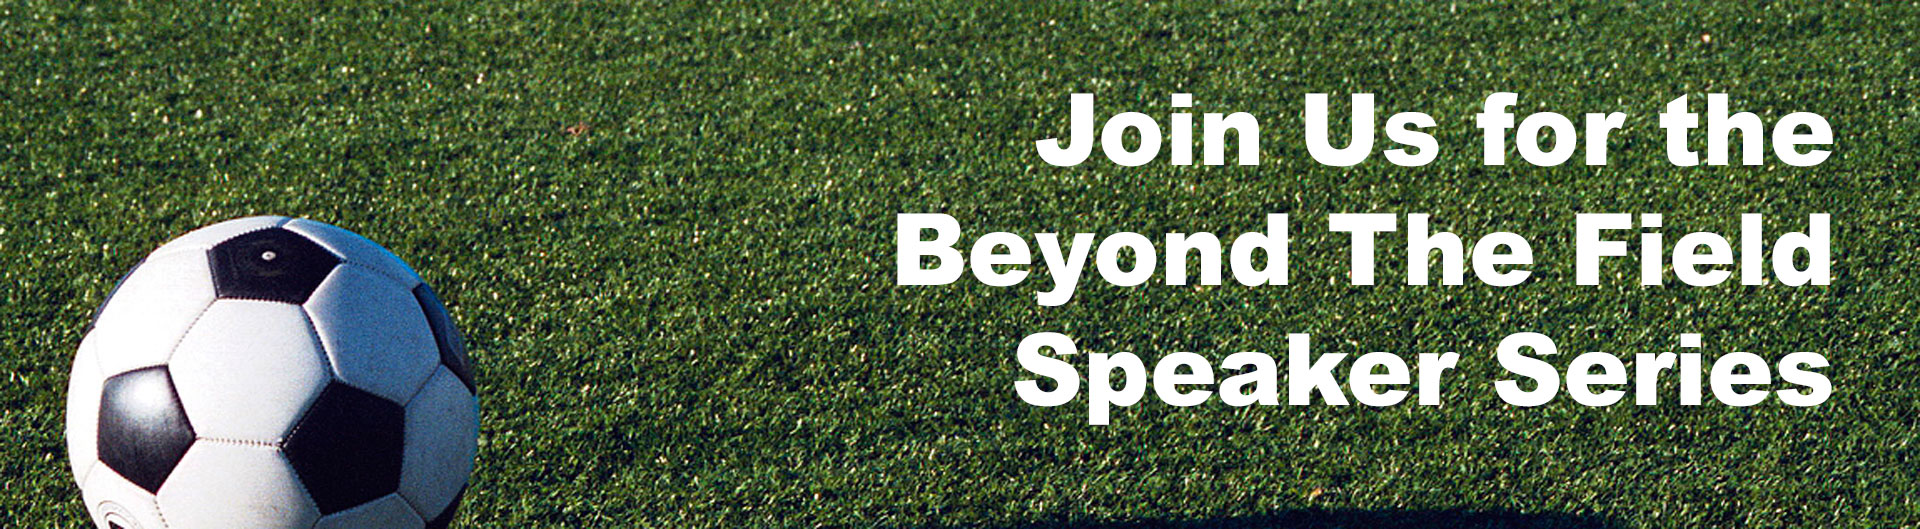 Soccer ball in green field promoting Beyond the Field Speaker Series